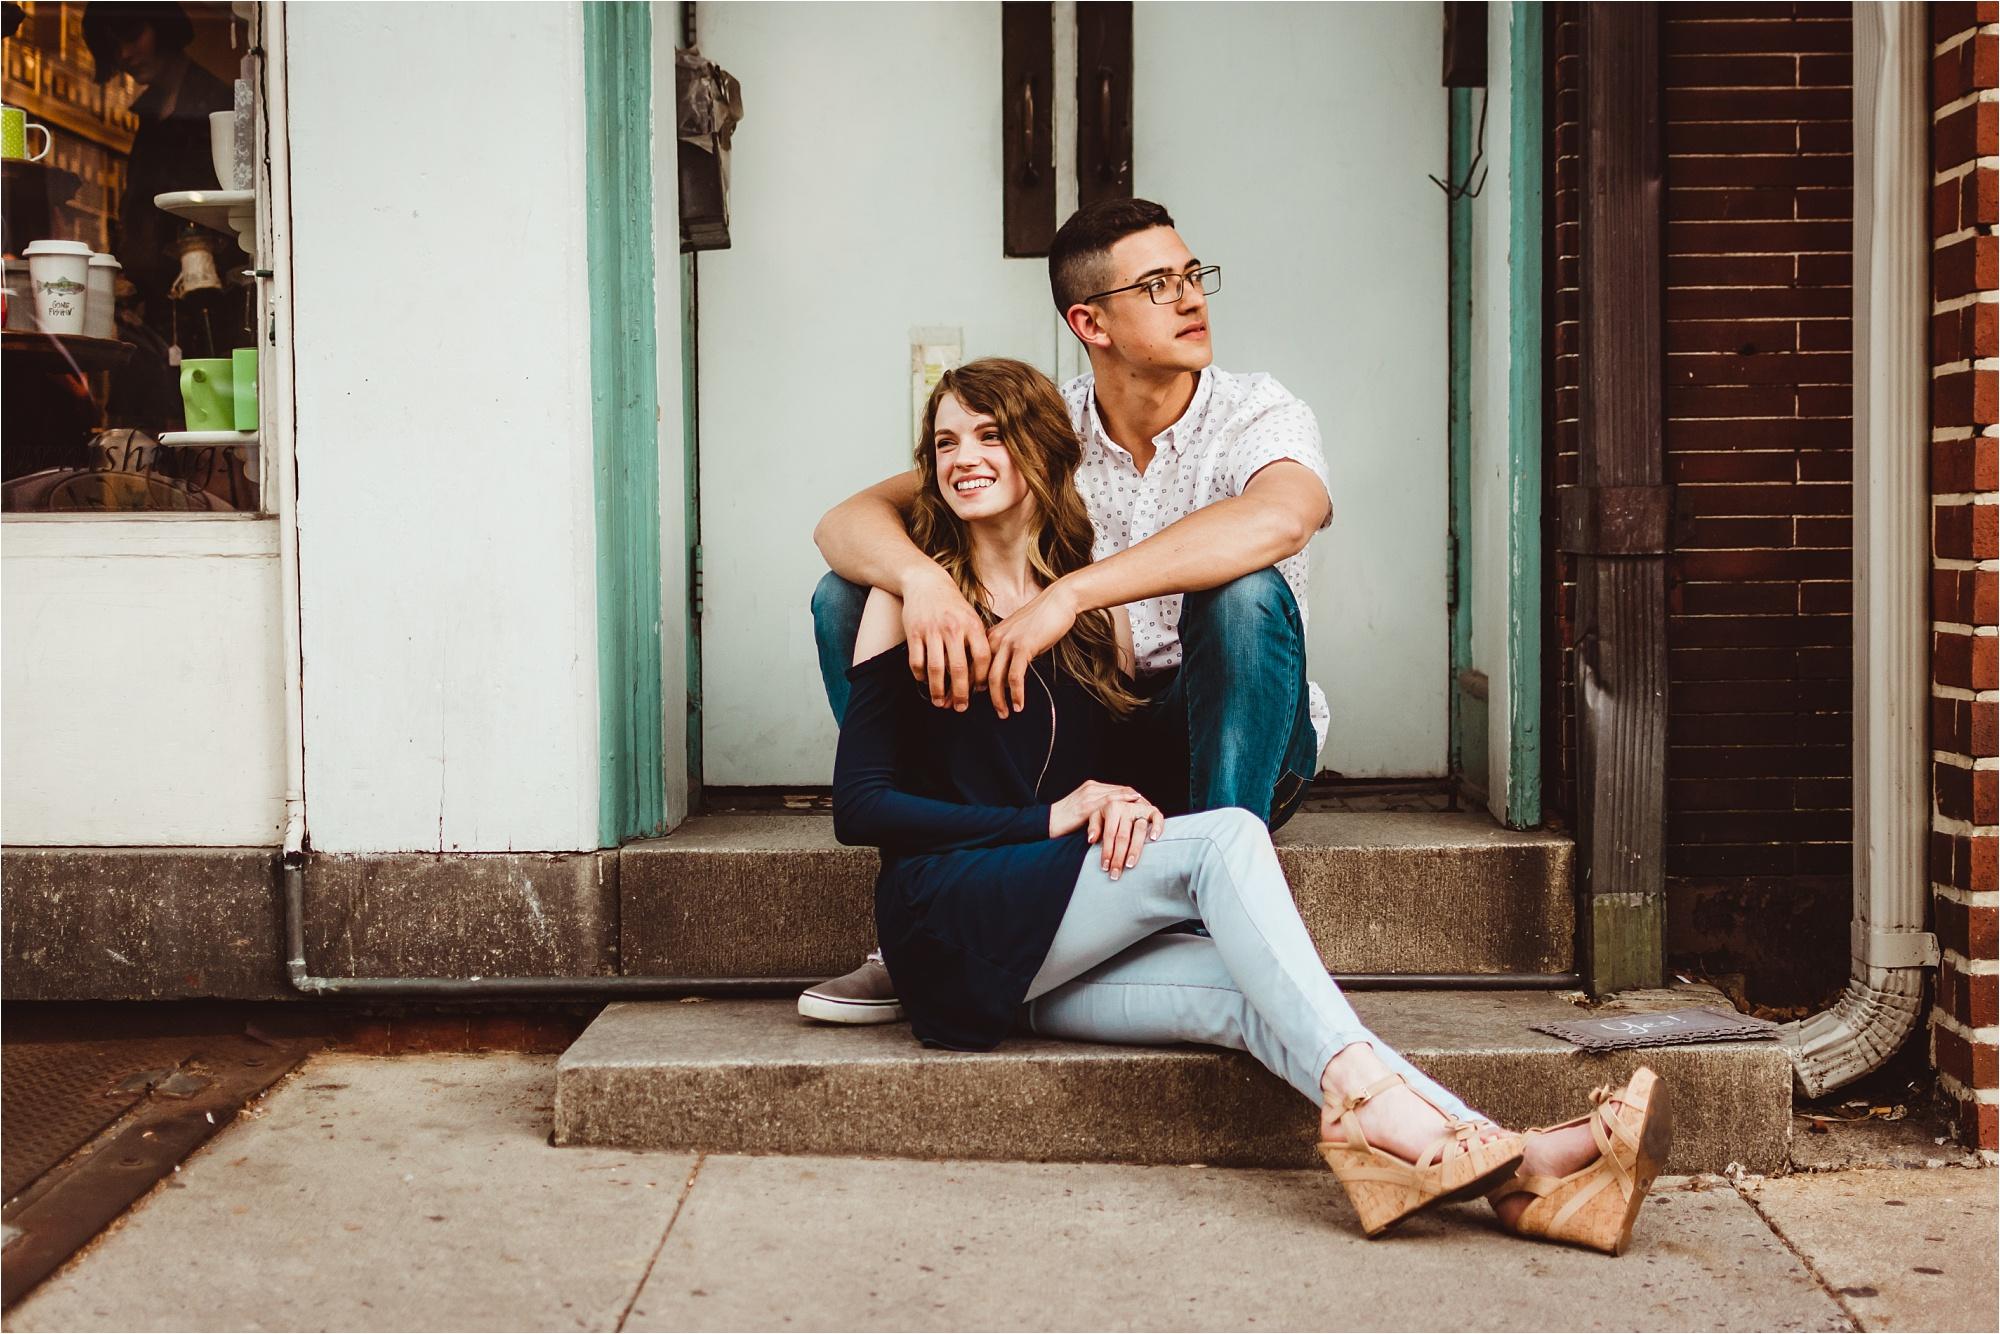 brittney-nestle-photo-nik-and-savannah-engagement-in-downtown-frederick.jpg